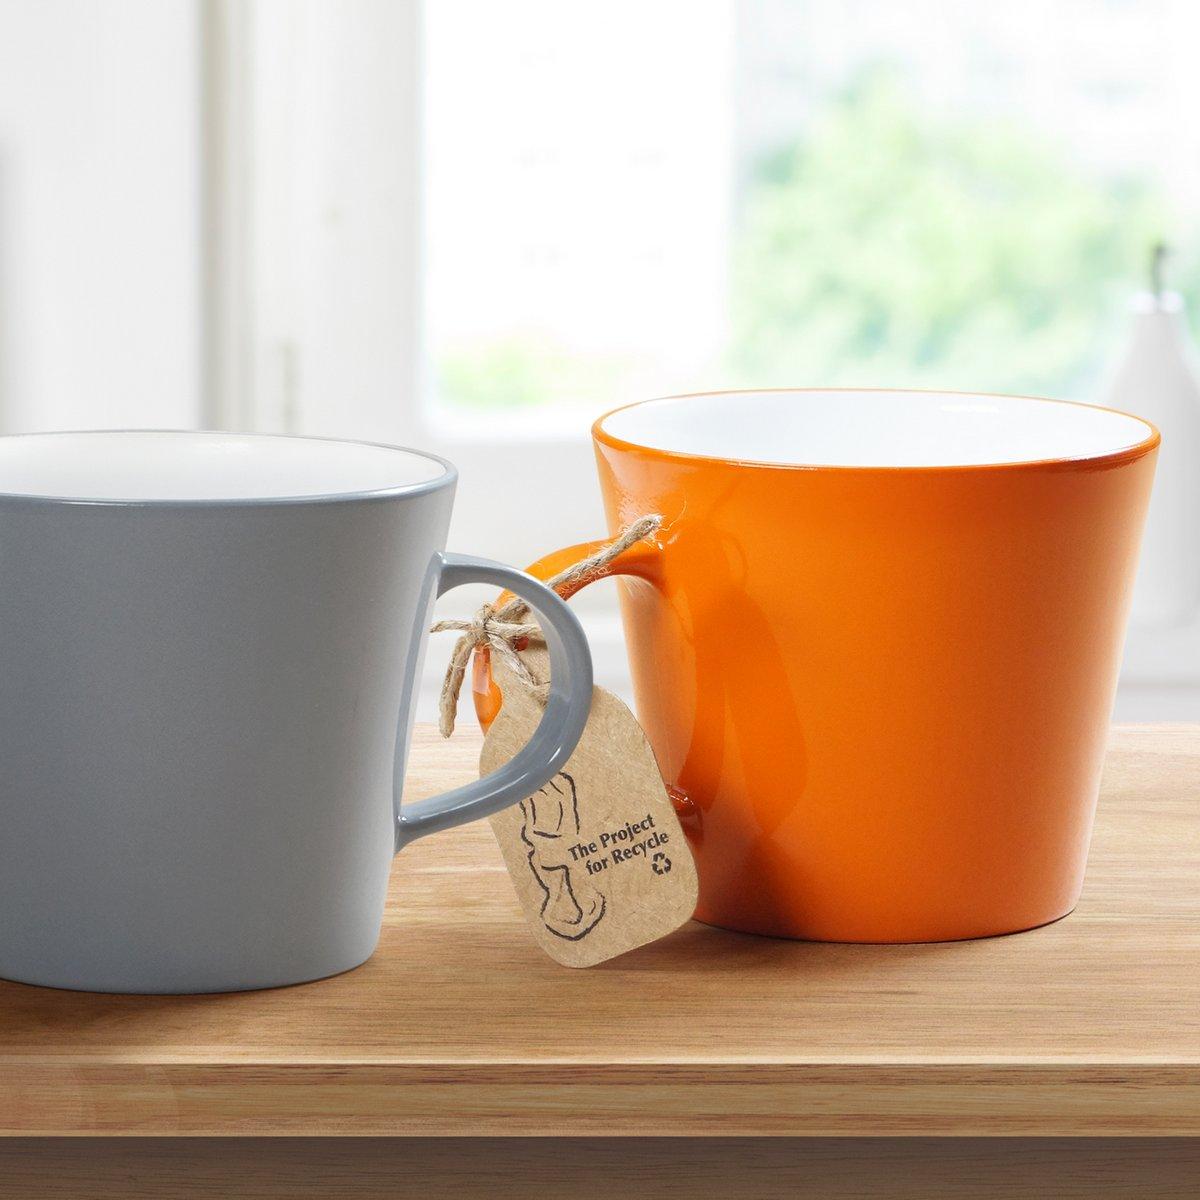 newlife mug en pet recycl 330ml zoom objets publicitaires personnalis s goodies publicitaires. Black Bedroom Furniture Sets. Home Design Ideas